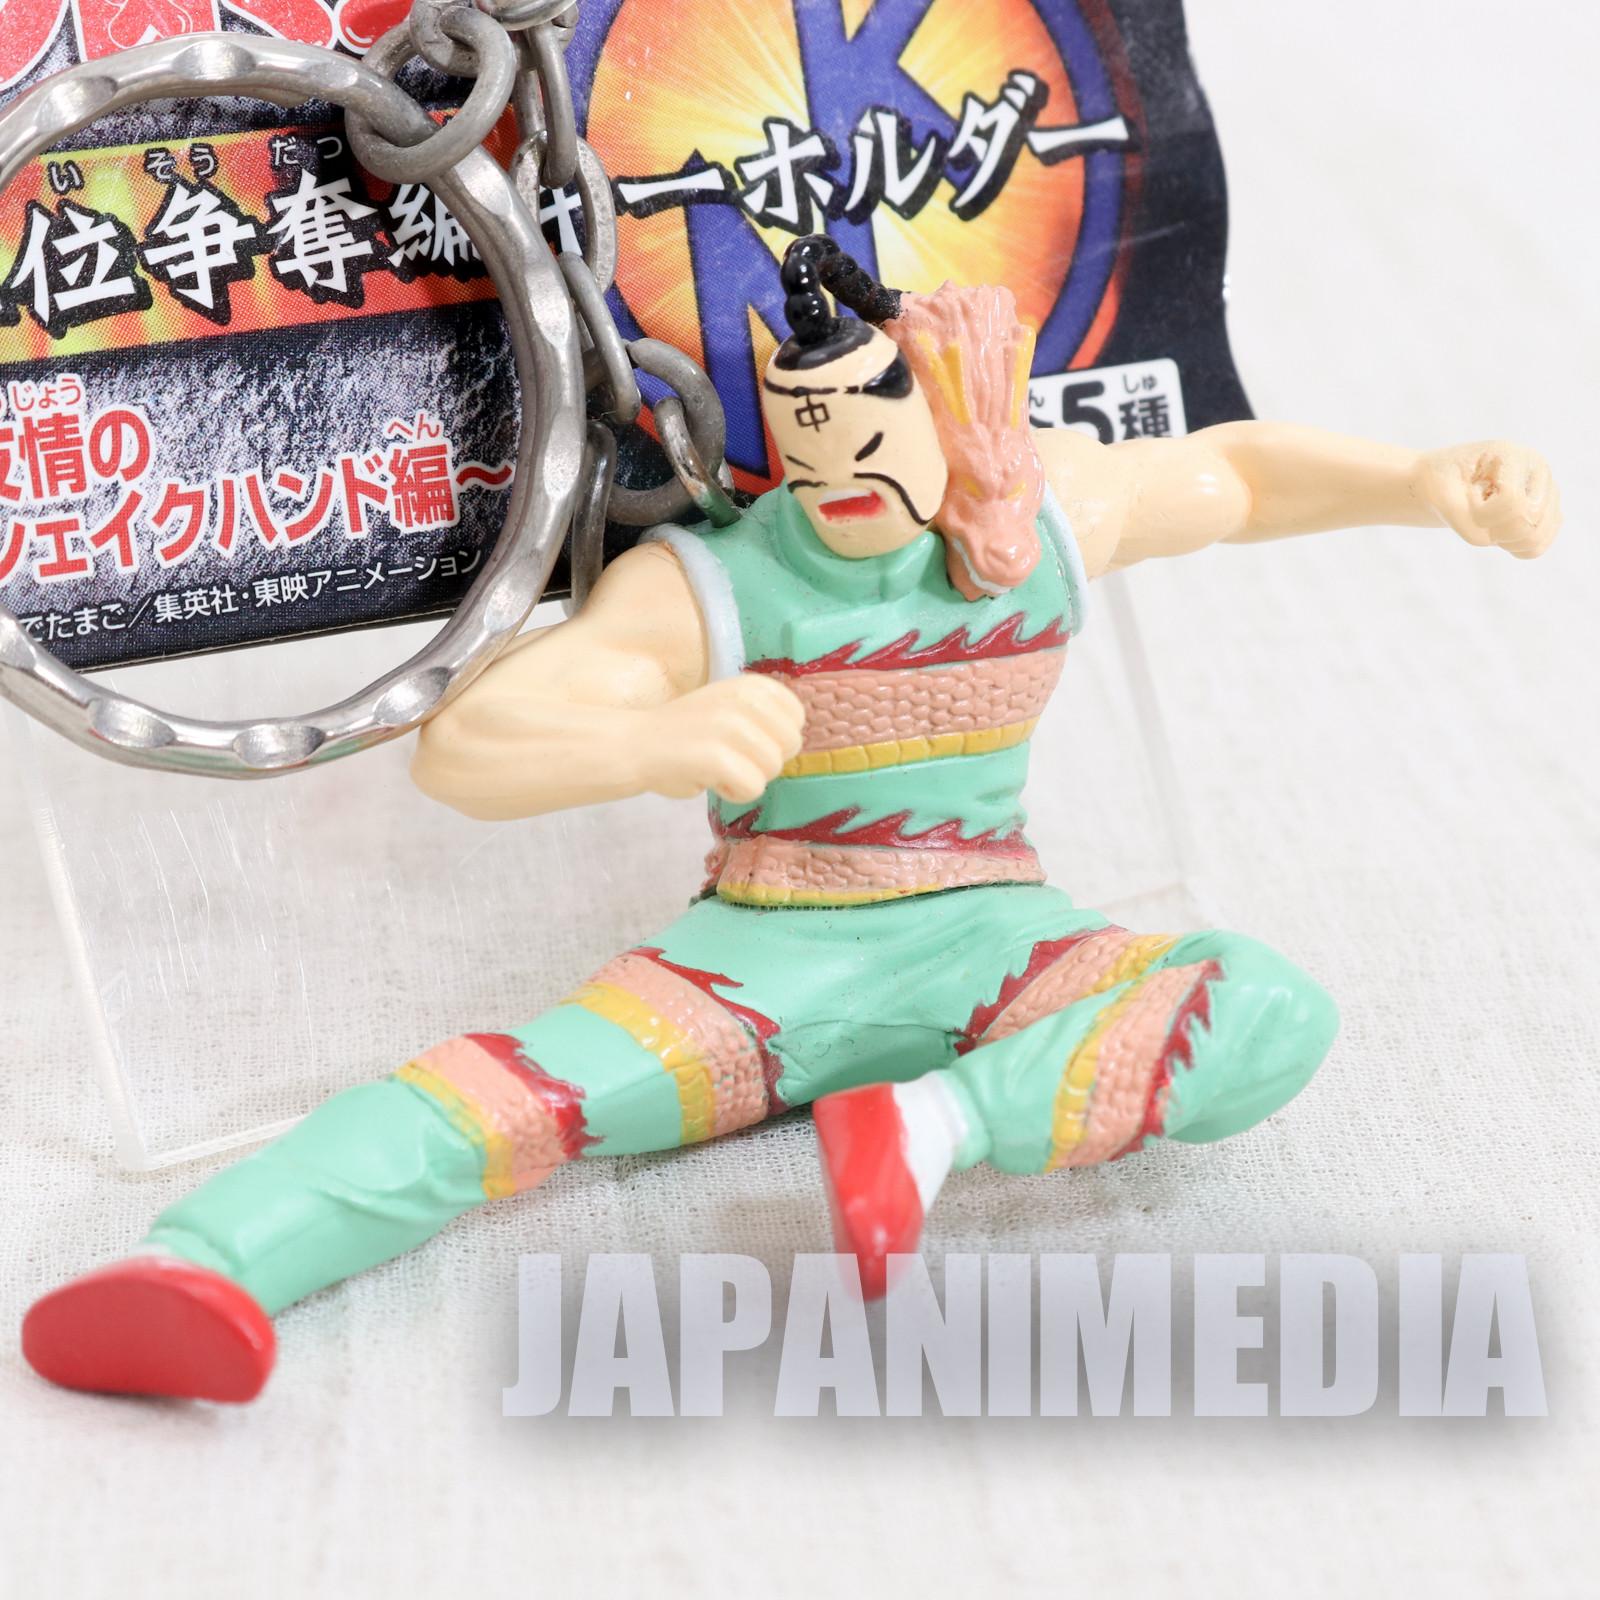 Kinnikuman Ramen Man Figure Key Chain Ultimate Muscle JAPAN ANIME MANGA 2